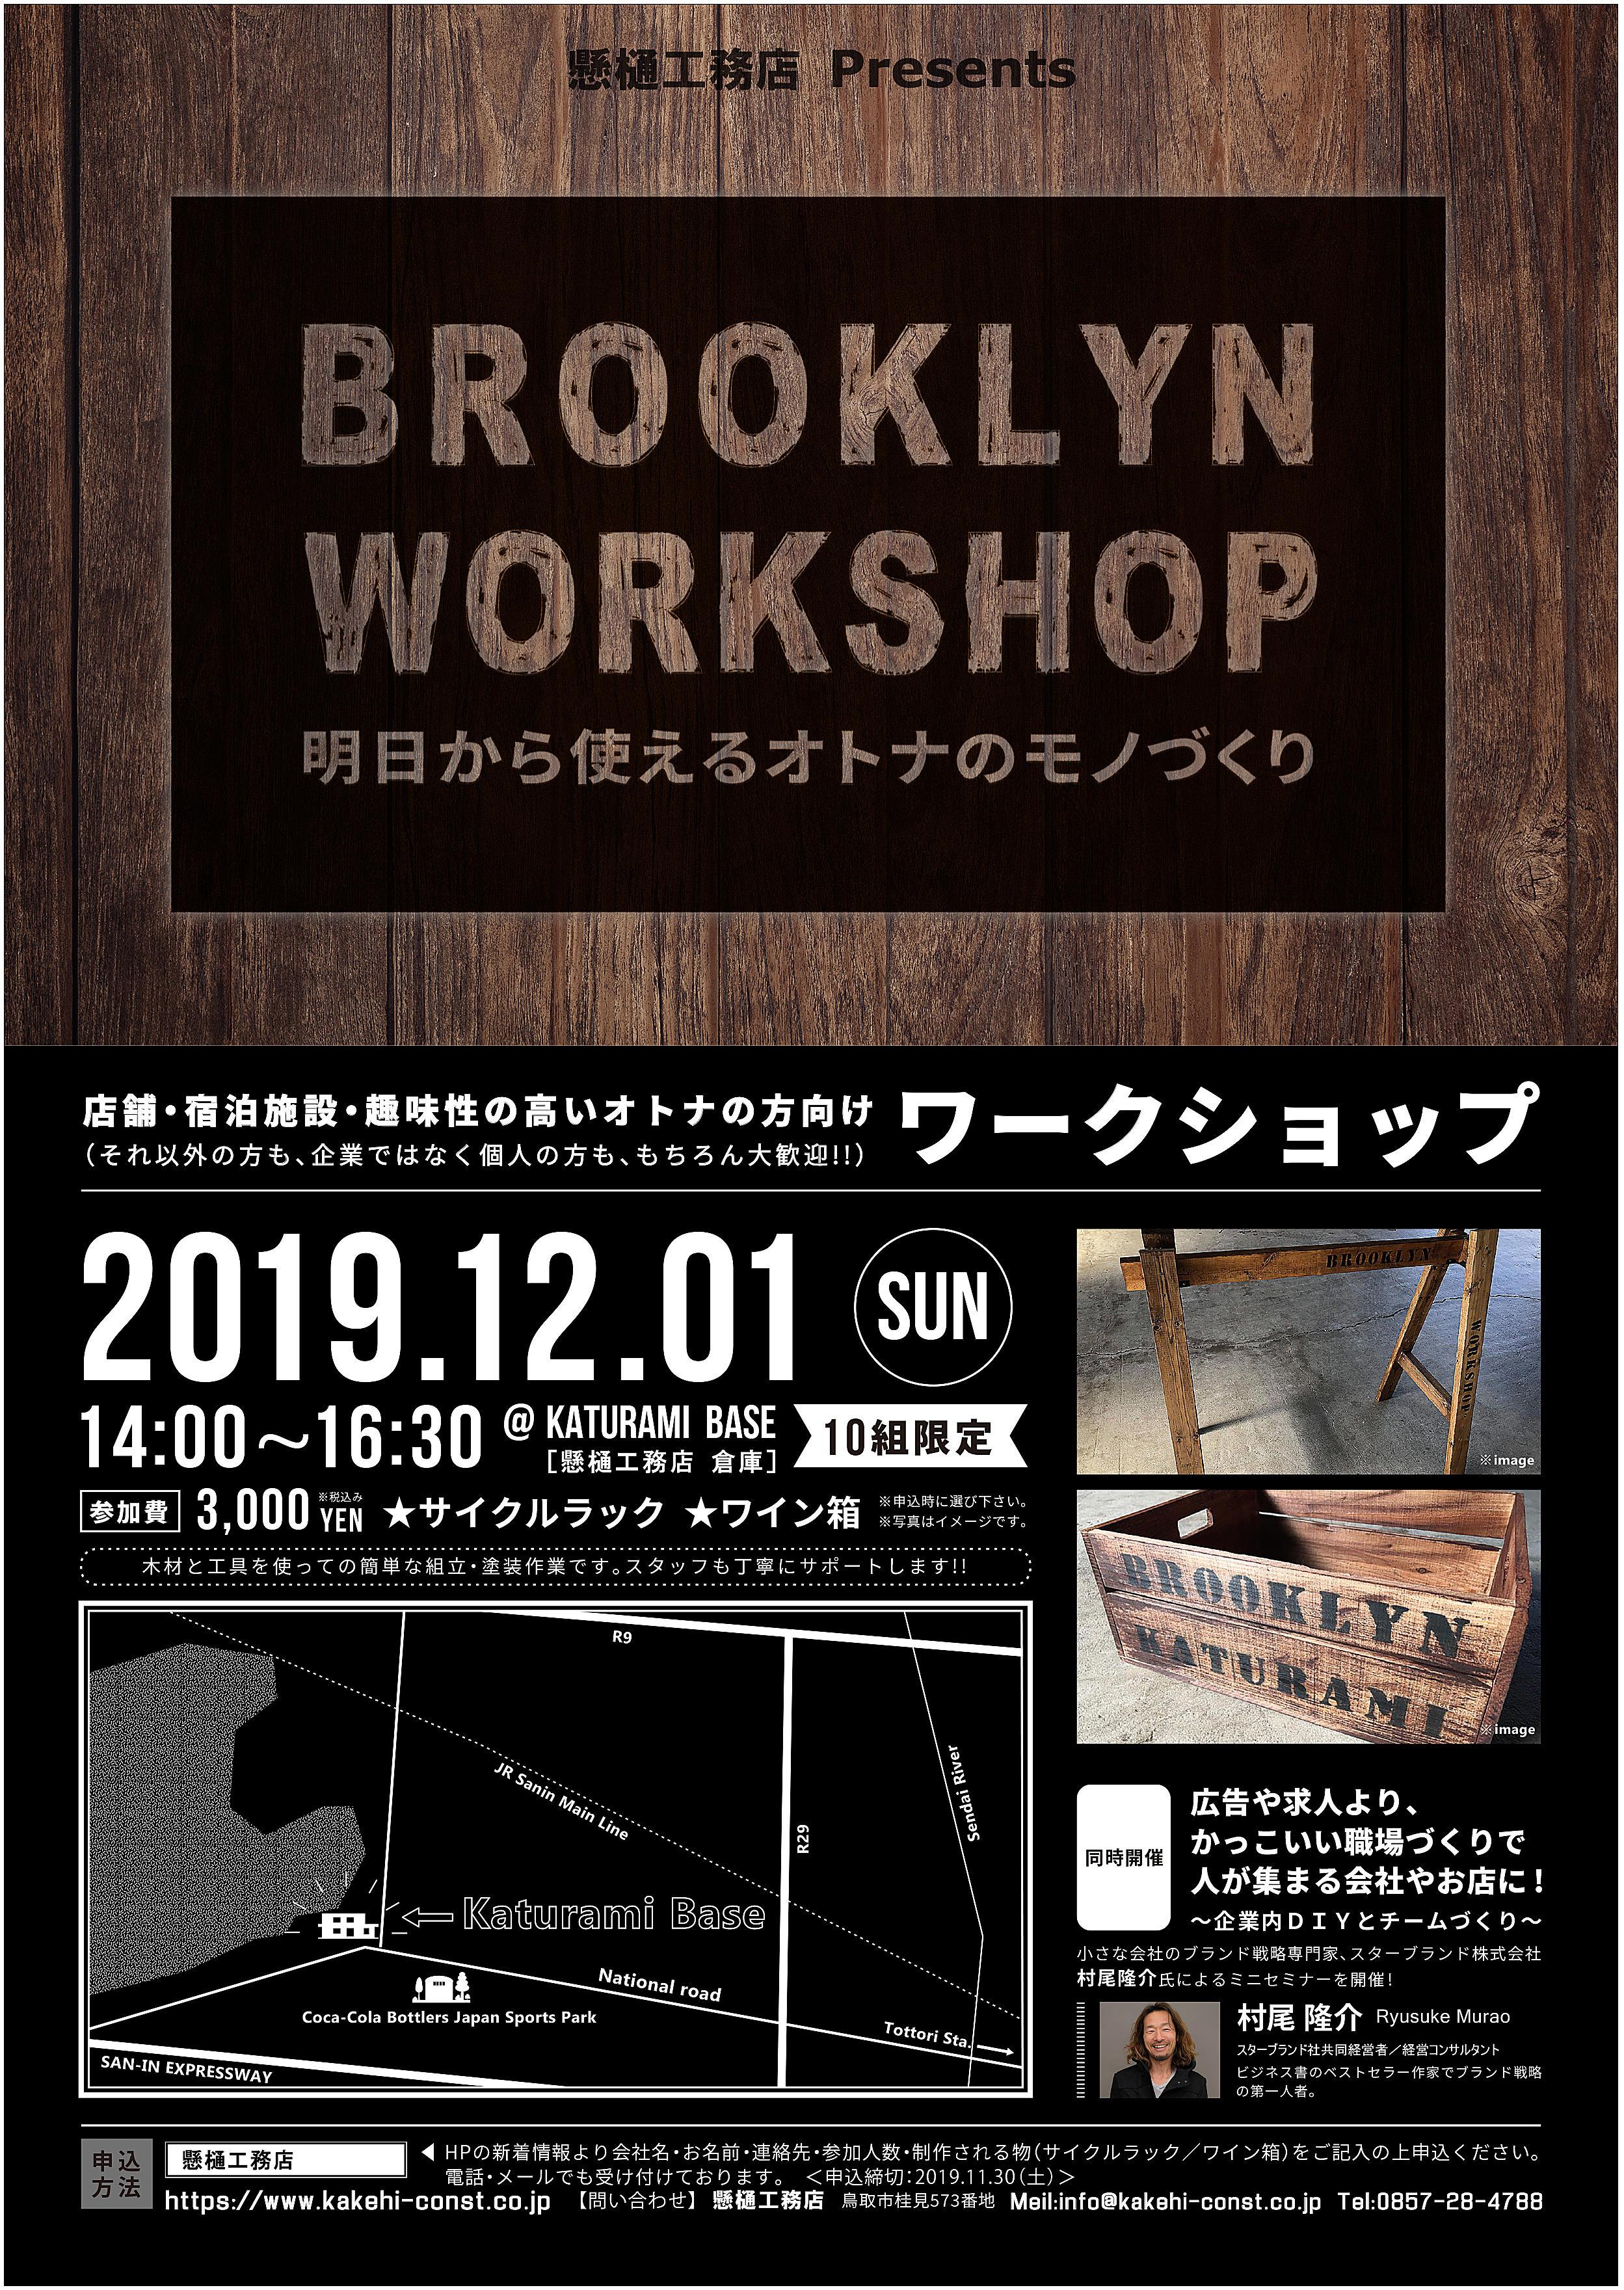 https://www.kakehi-const.co.jp/upload/ea4c08449e0fcd57fdc3b23b4d4e8ea3ba96dc95.jpg